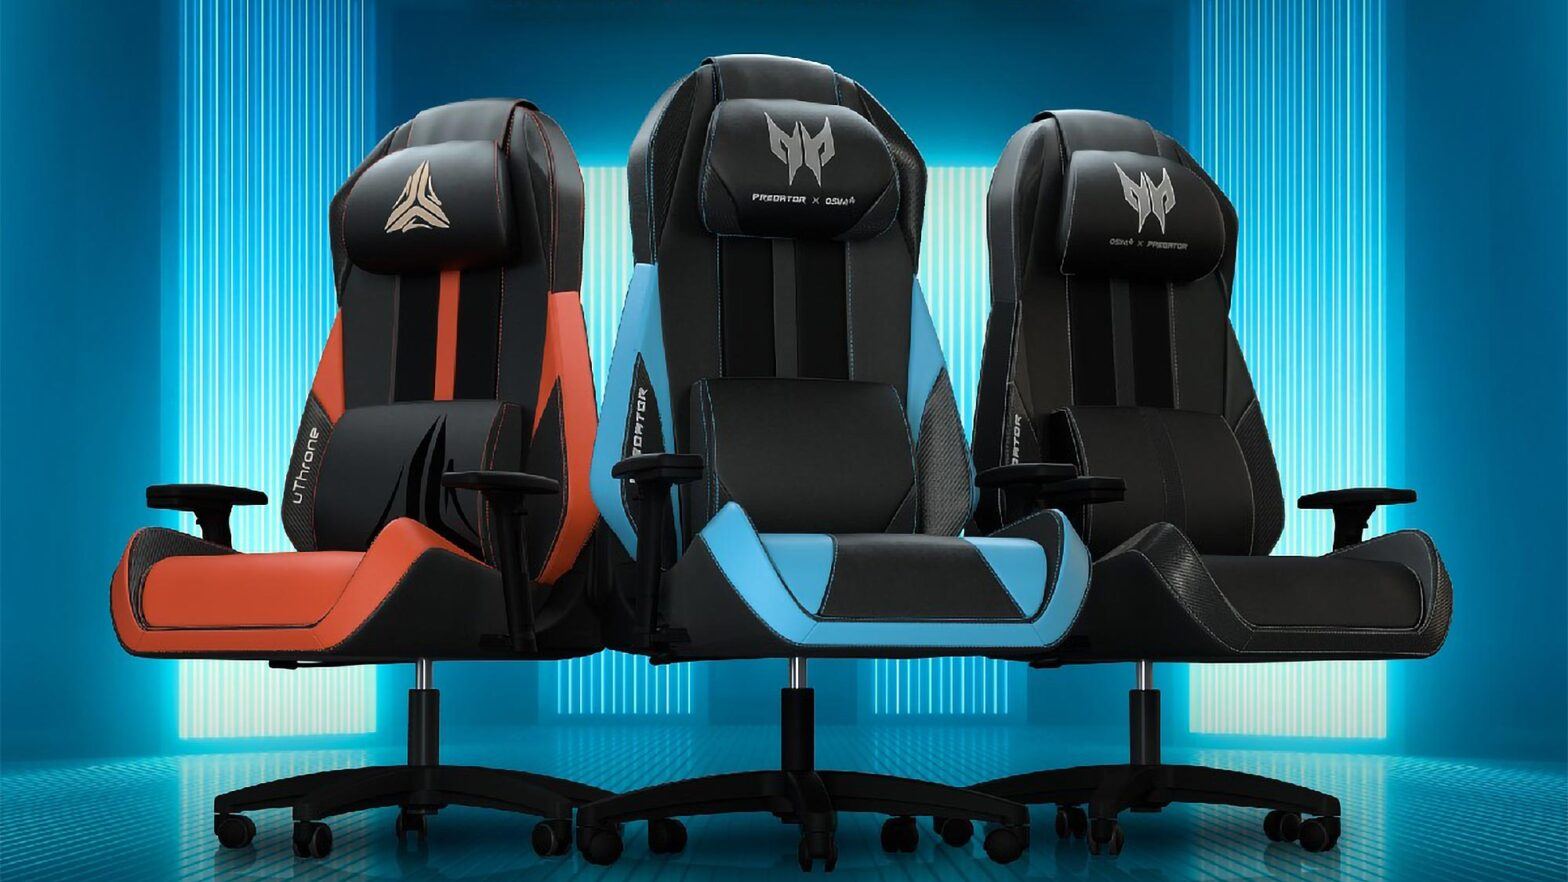 Predator x OSIM Gaming Massage Chair